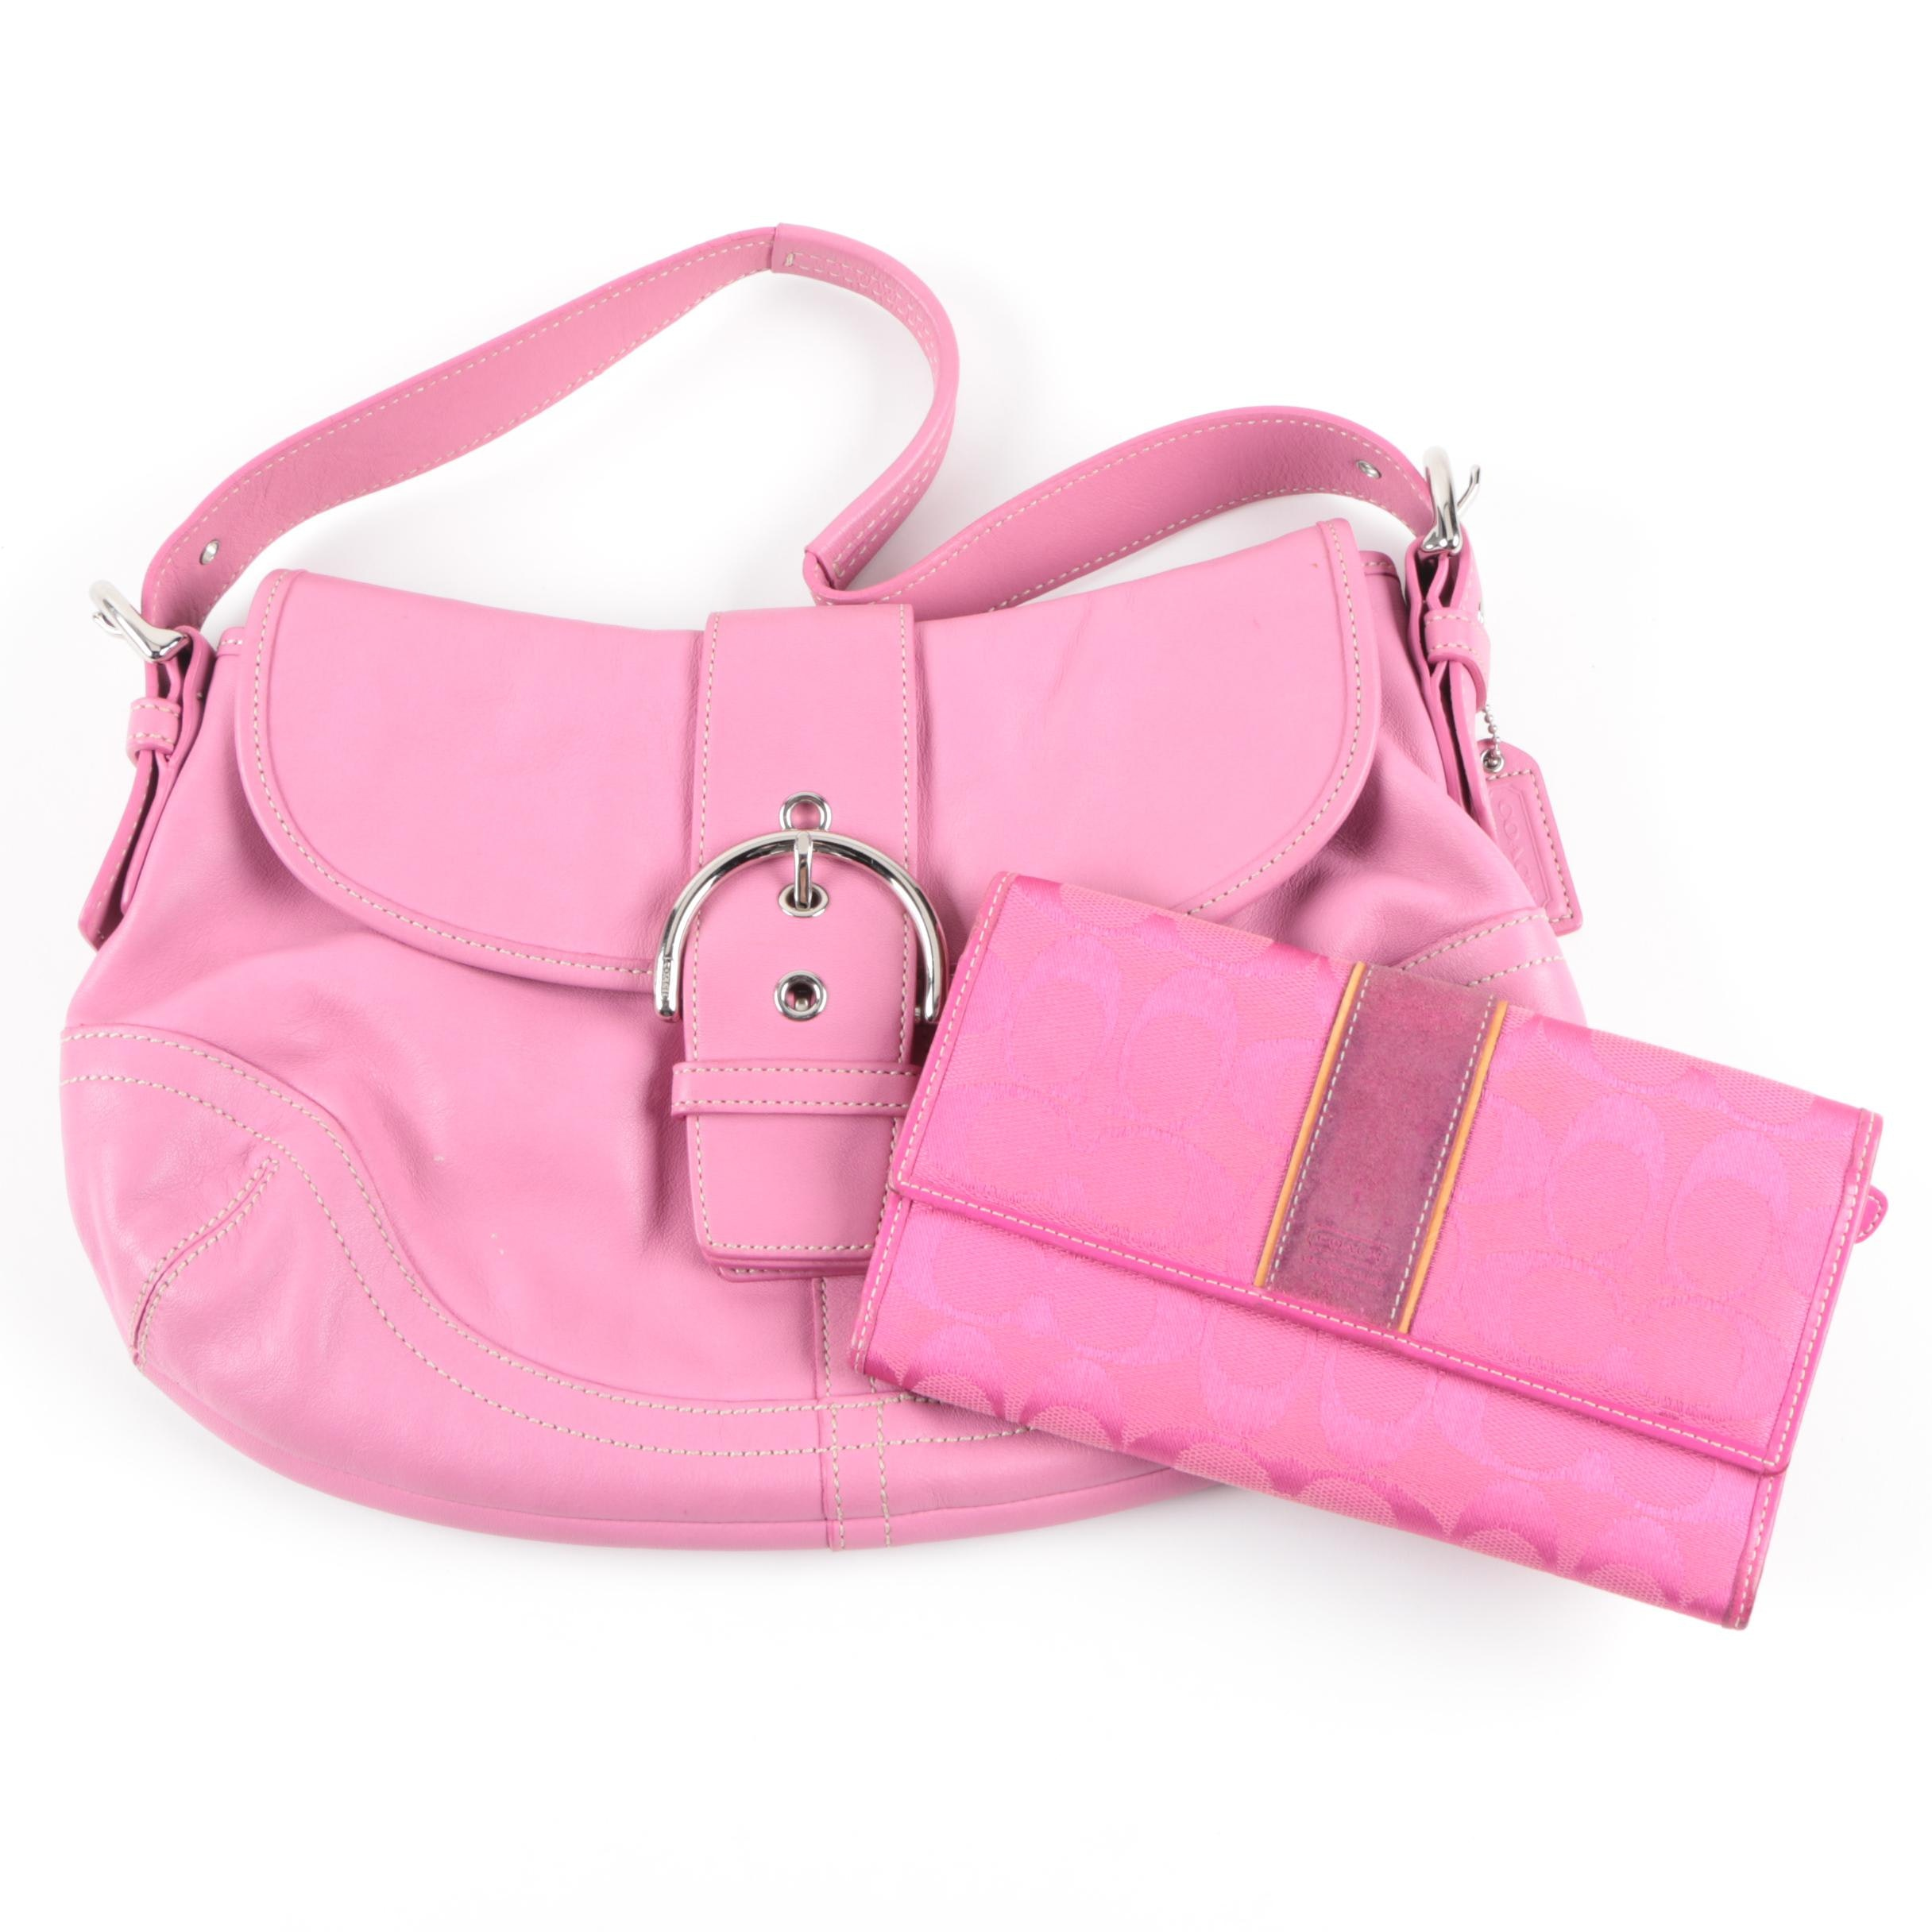 Coach Soho Hobo Orchid Leather Handbag and Wallet